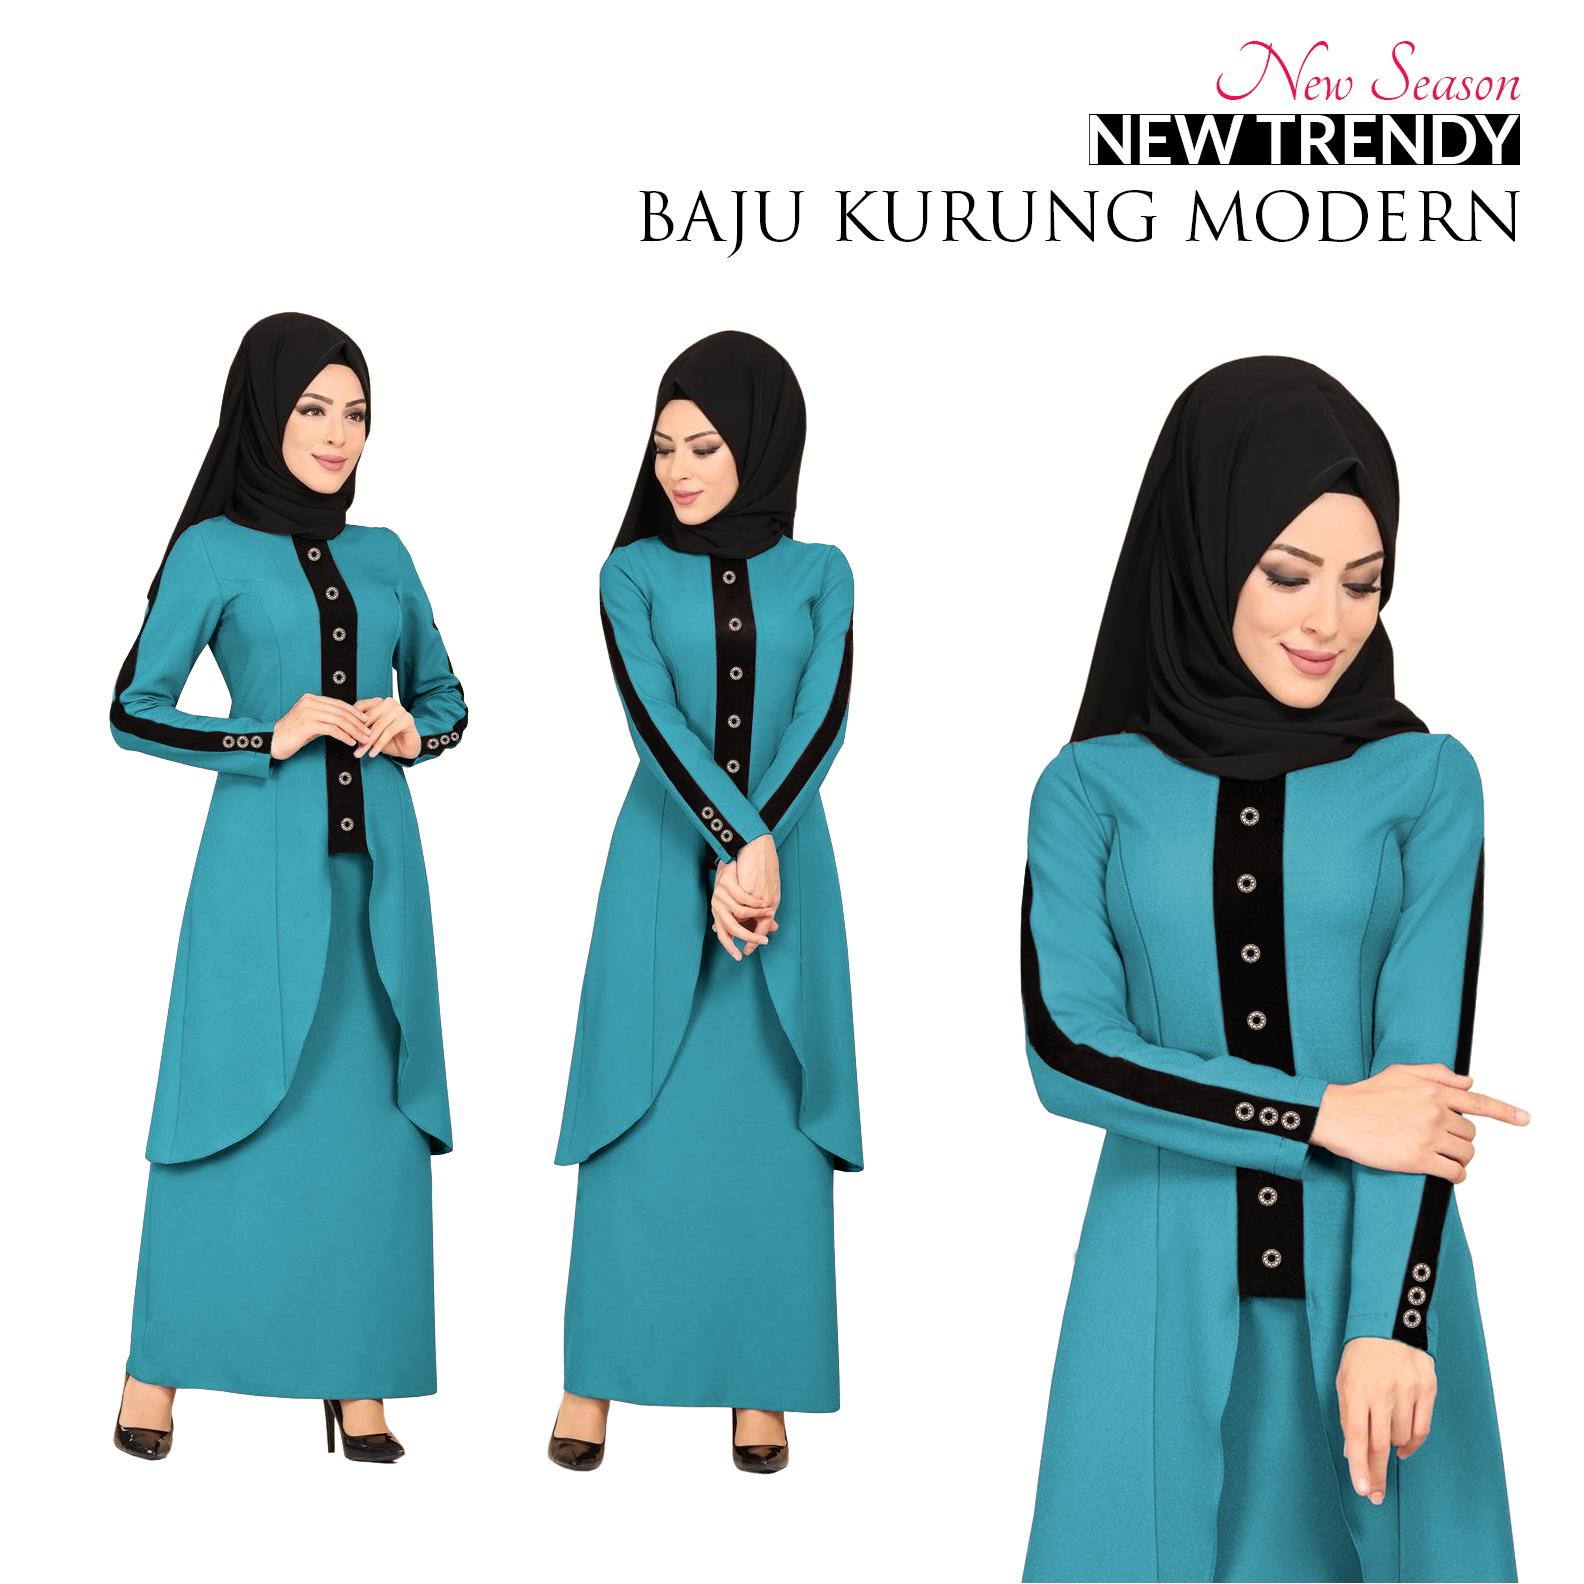 New Collection New Season Trendy Baju Kurung Modern for Muslimah Terbaik